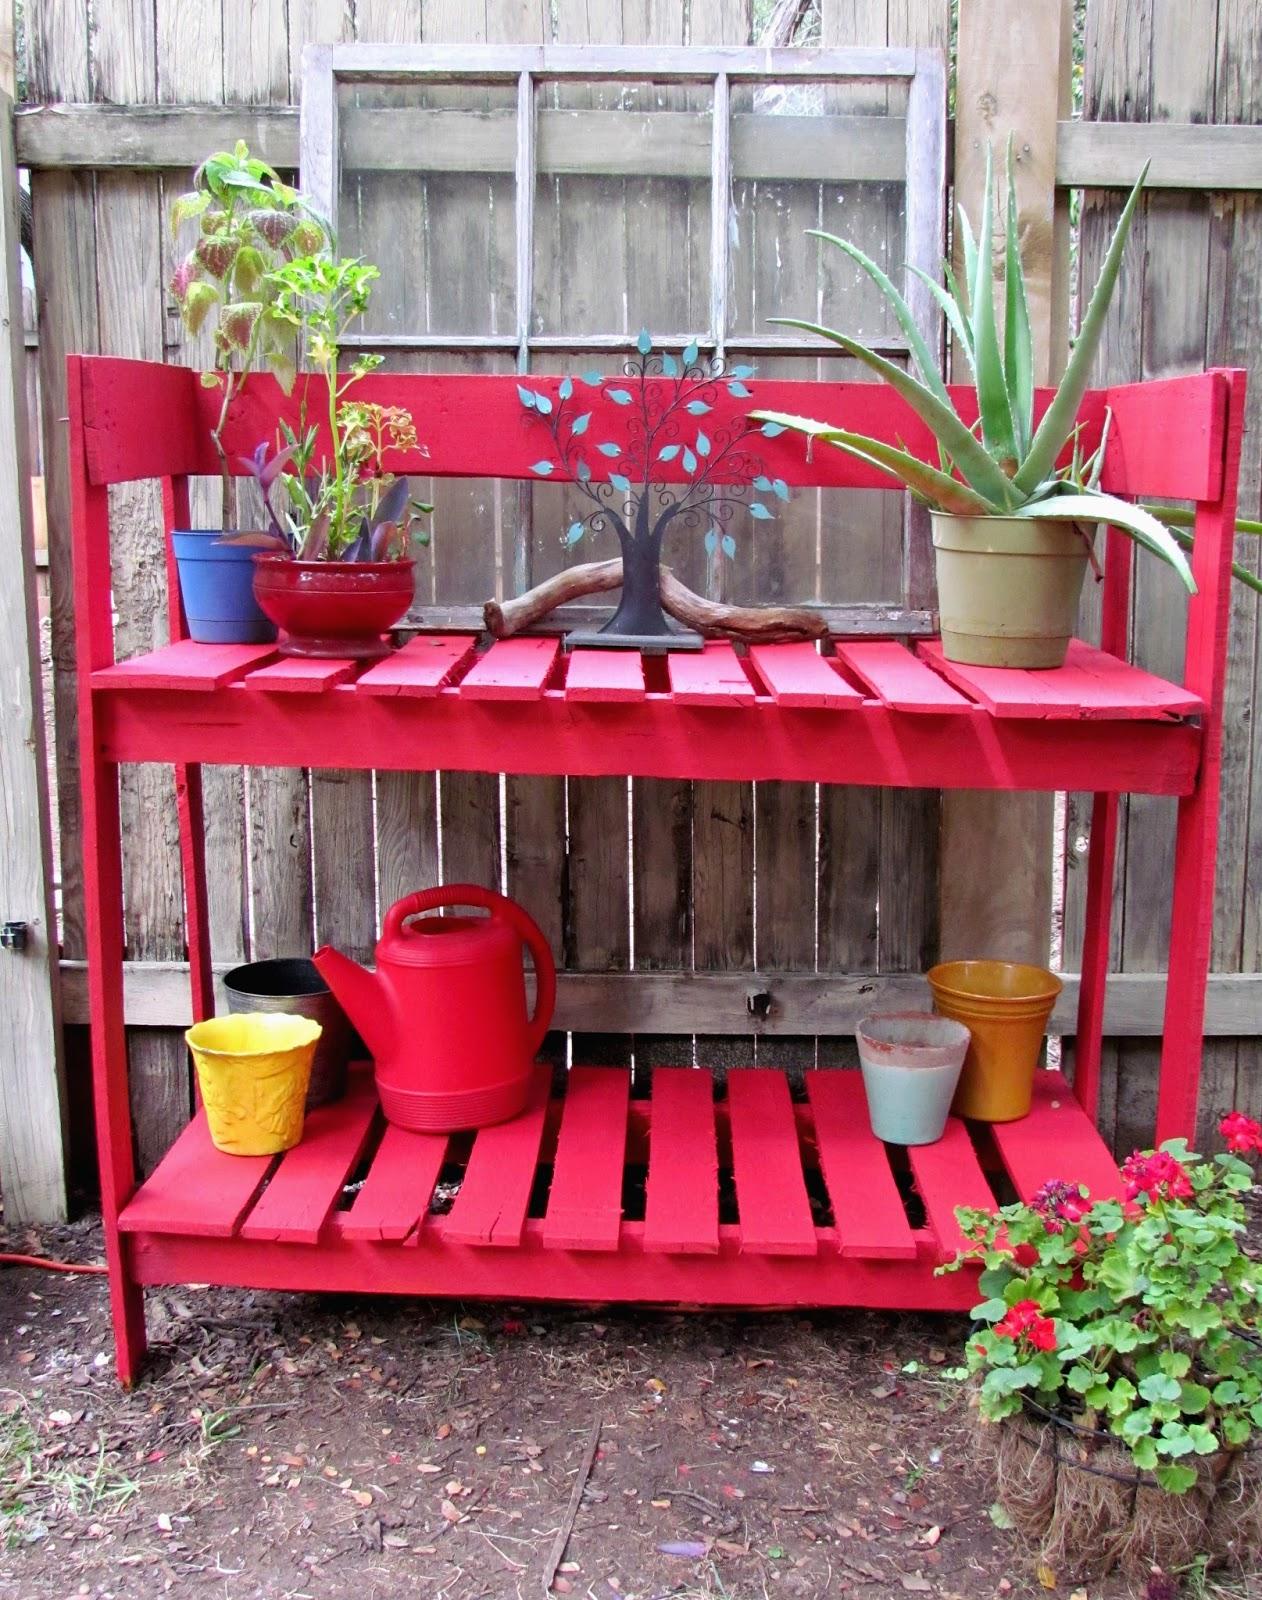 Gypsies Crafts & Treats: Pallet Potting Bench